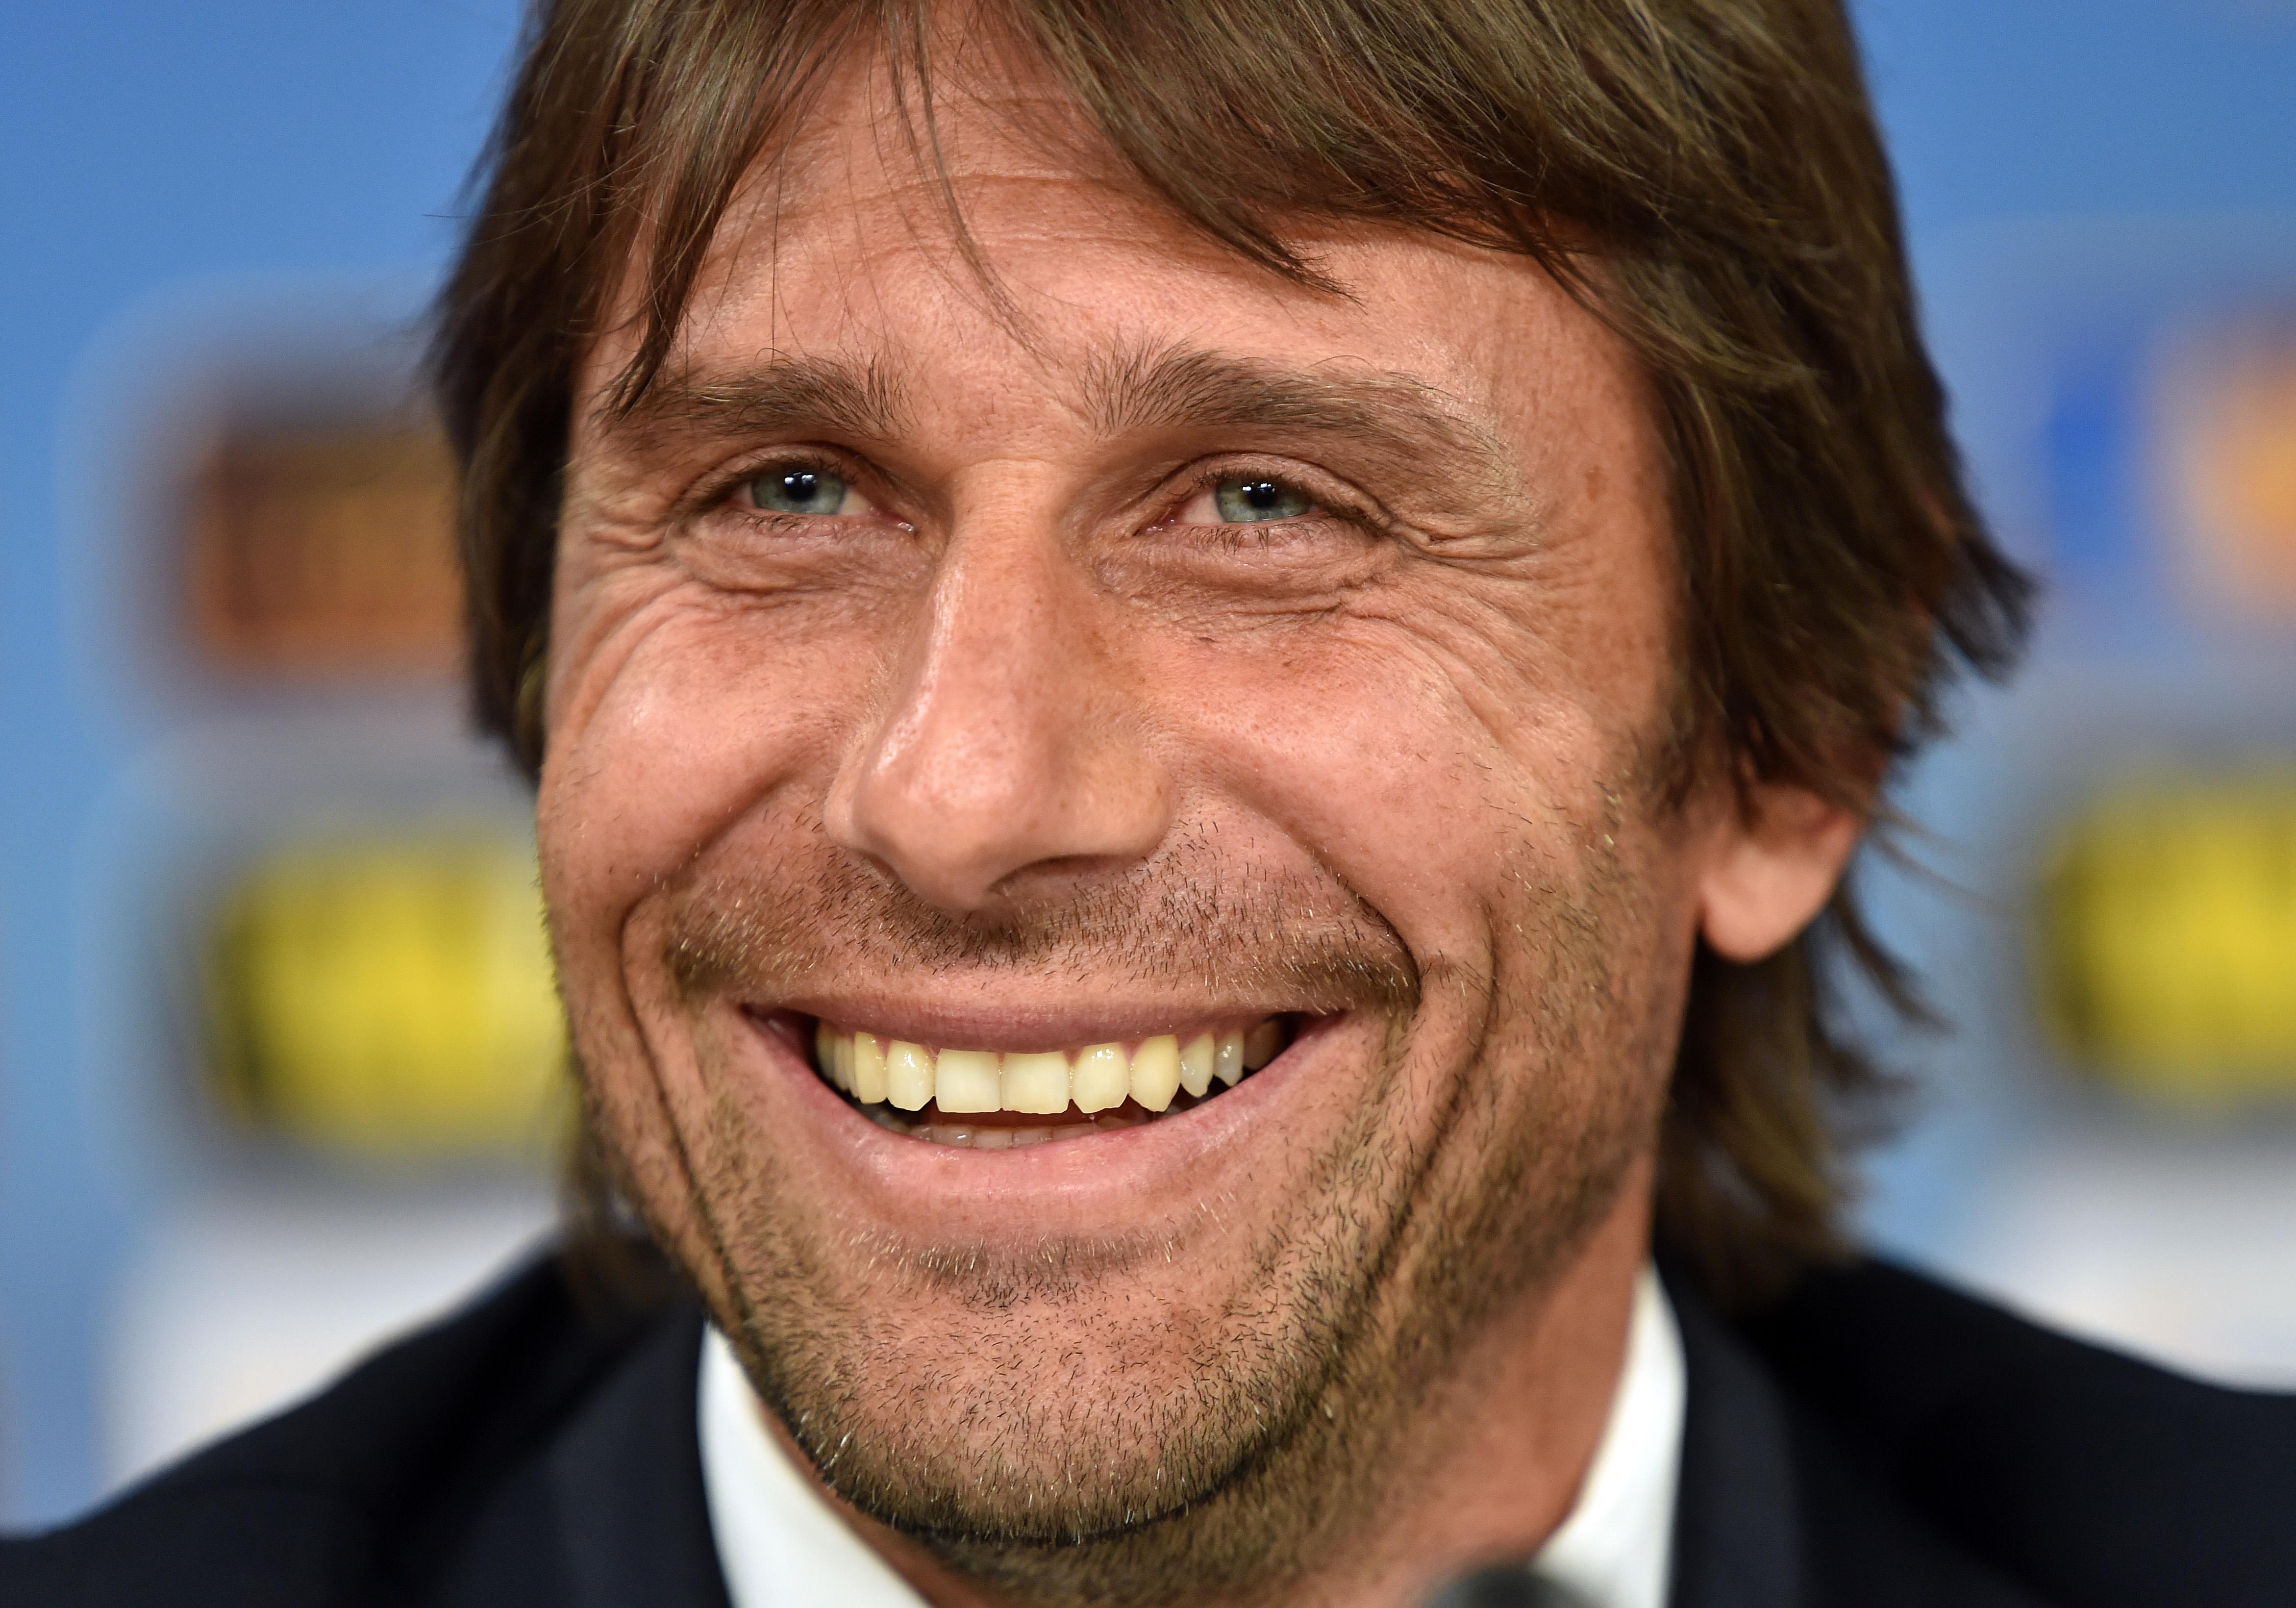 Antonio Conte and Inter's next step